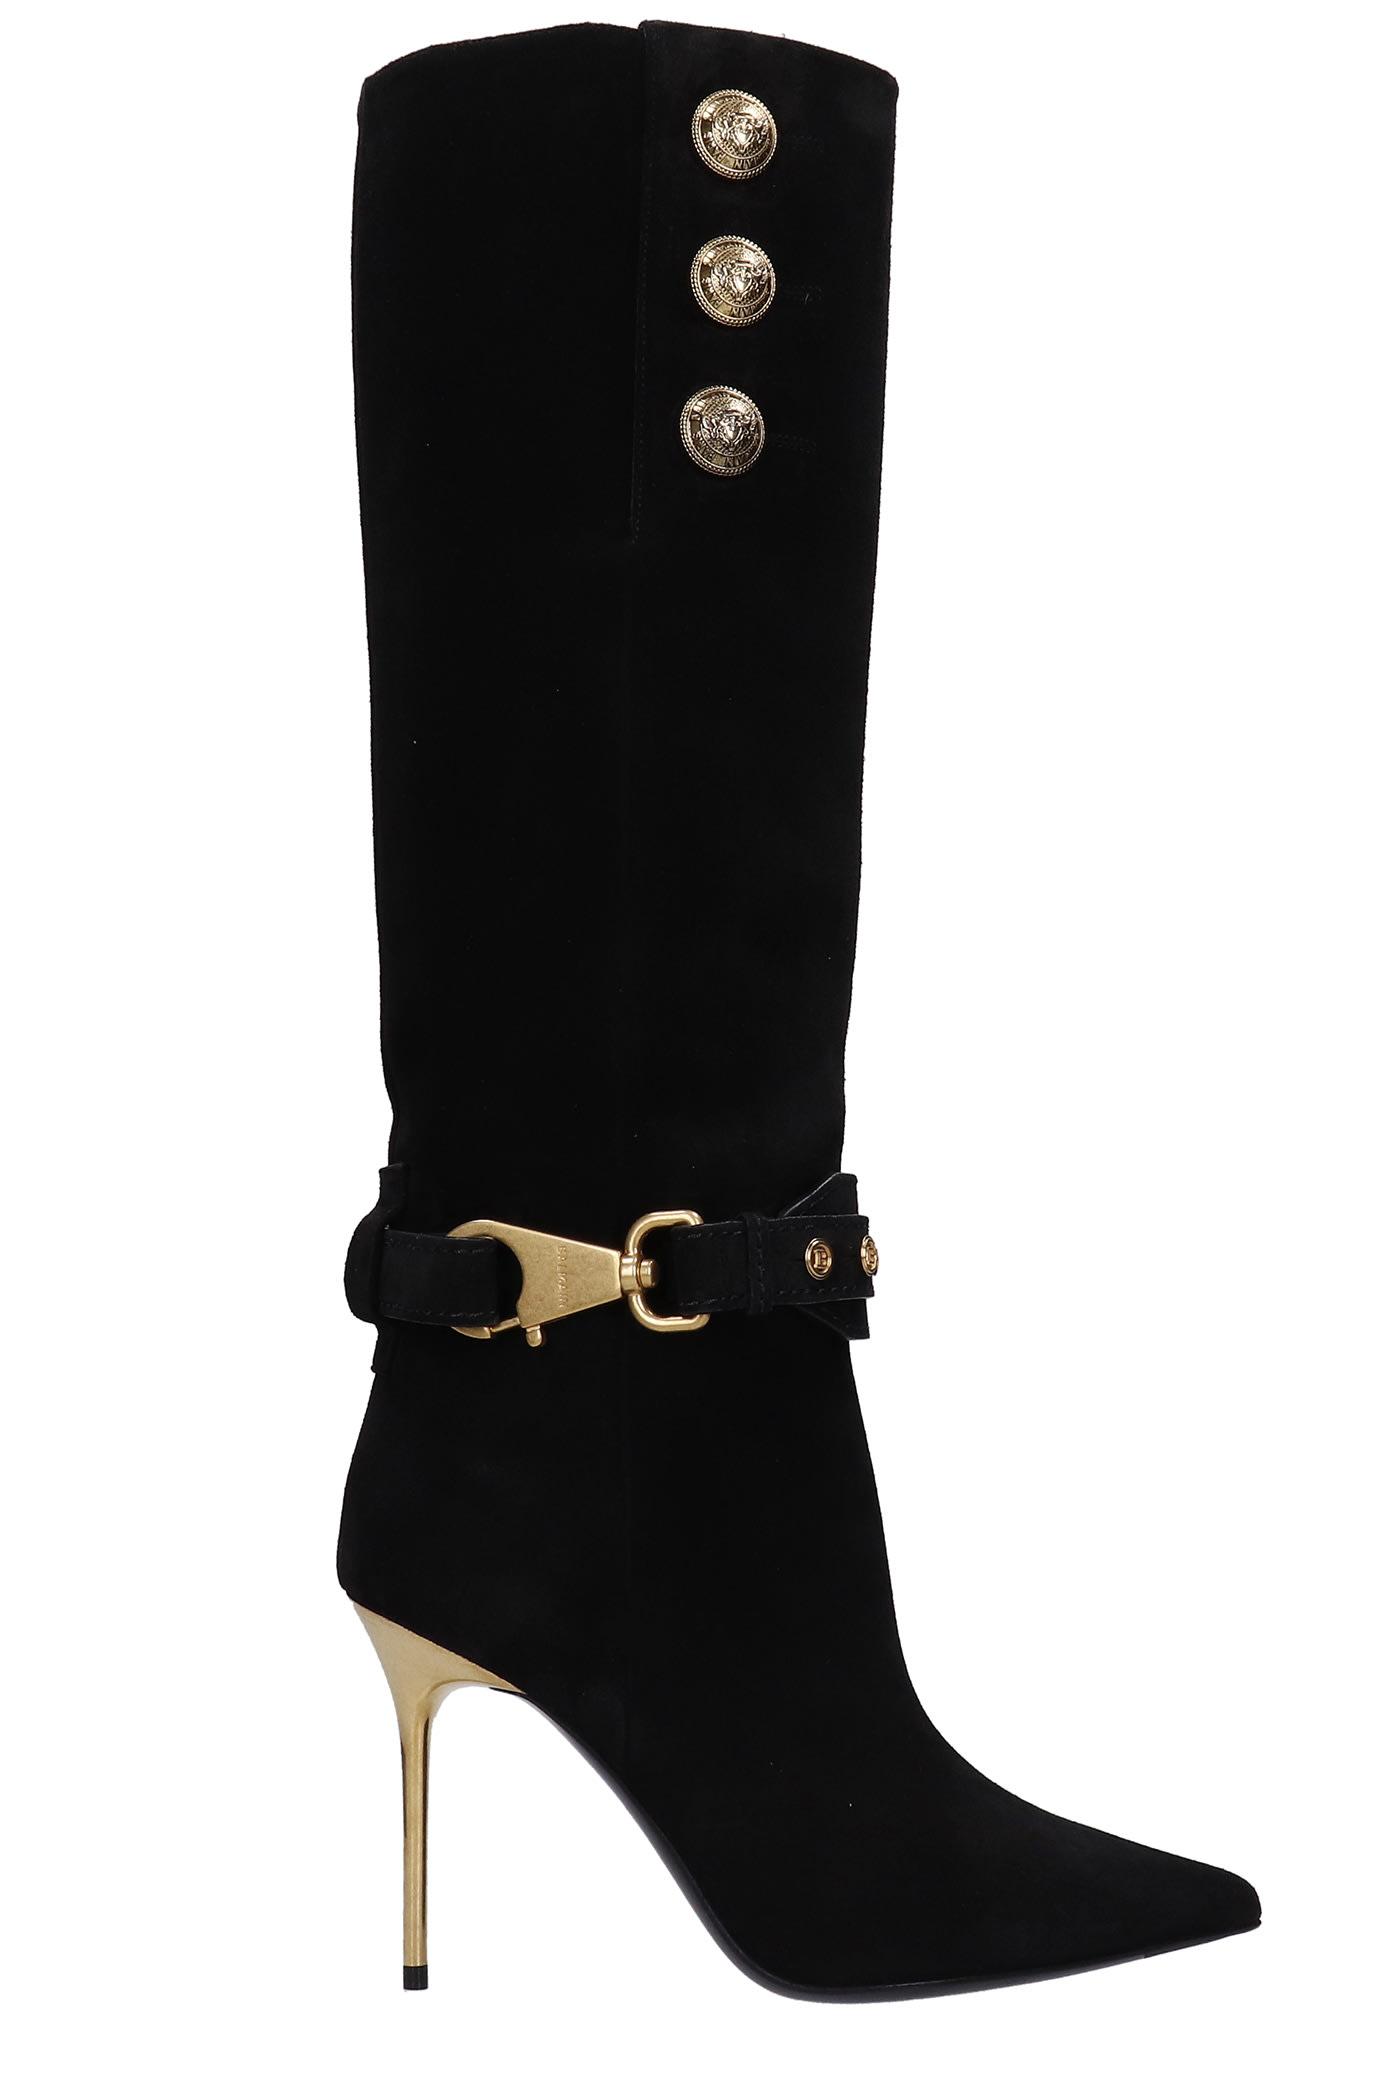 Buy Balmain Robin High Heels Boots In Black Suede online, shop Balmain shoes with free shipping